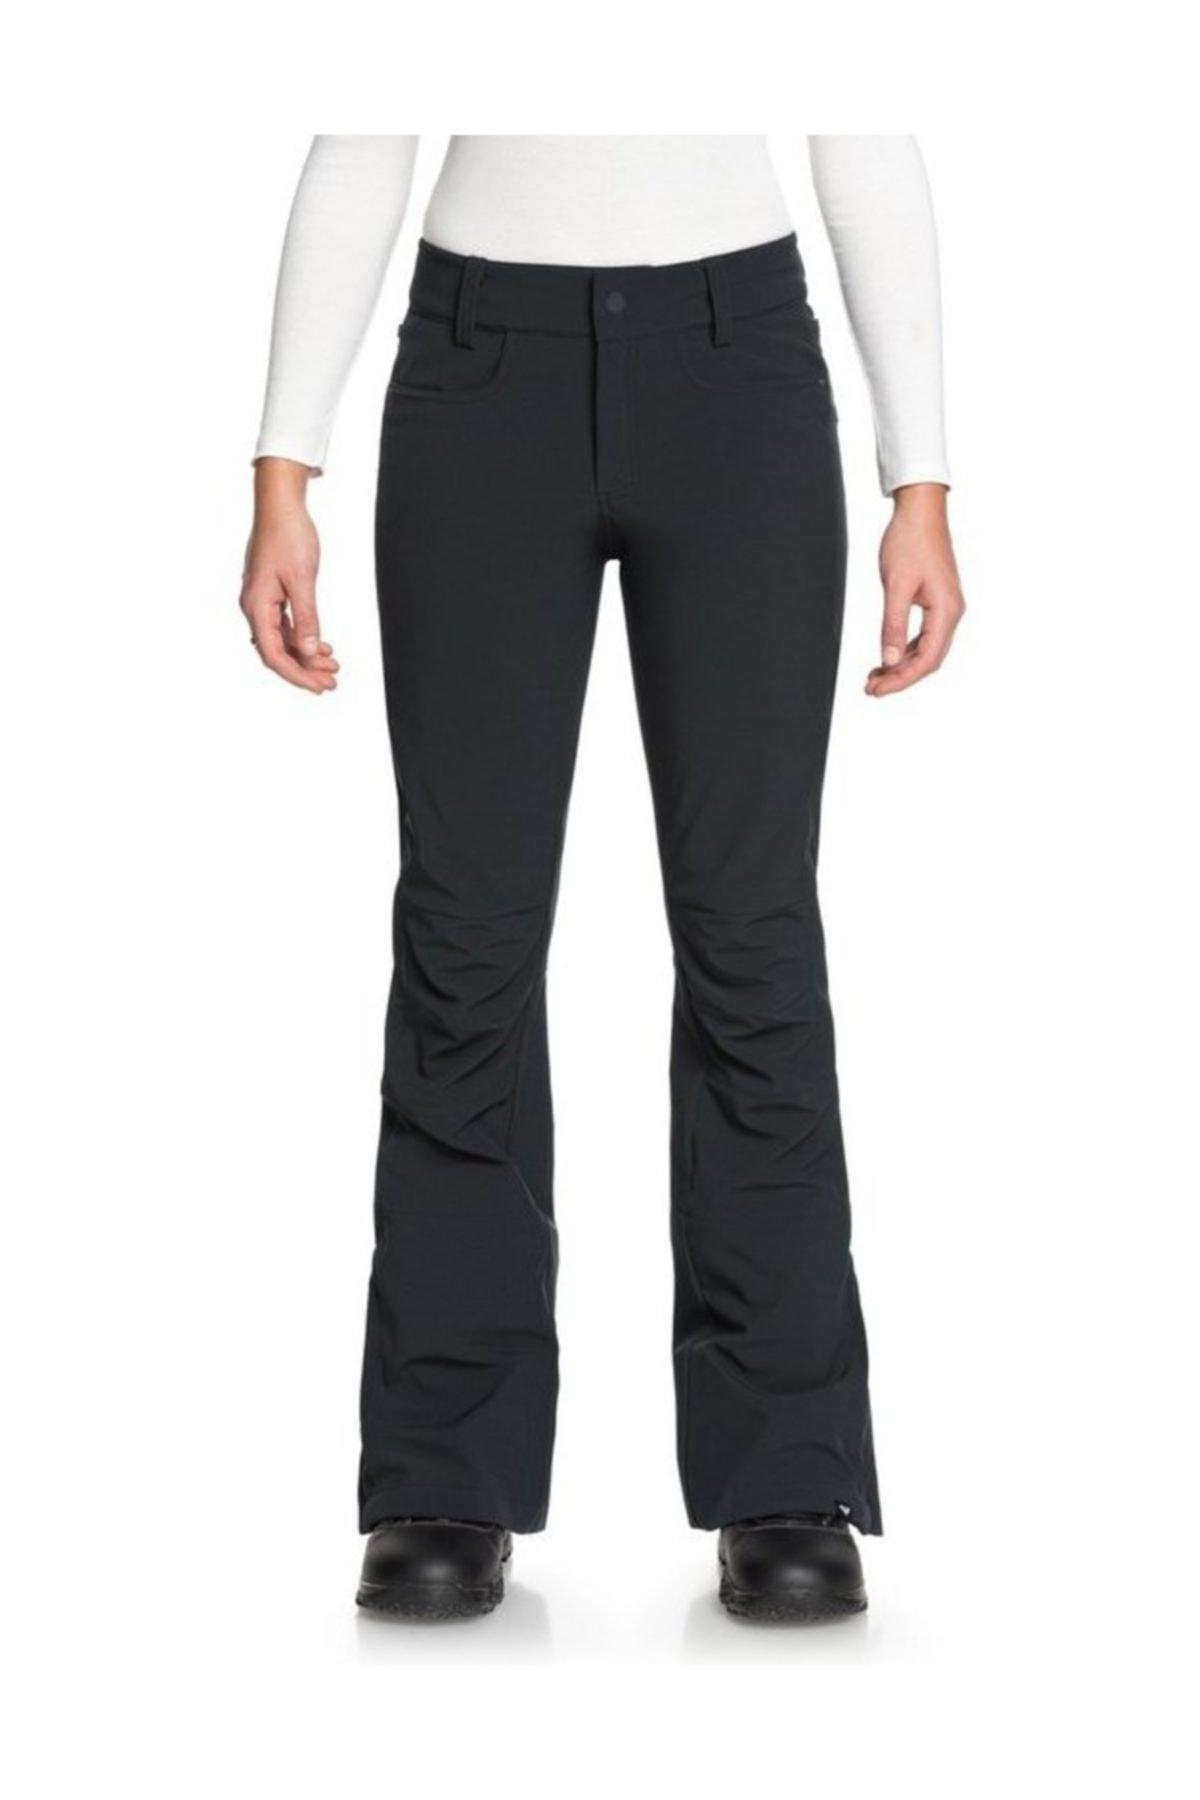 Roxy Creek Snow Kadın Pantolon ERJTP03060 1